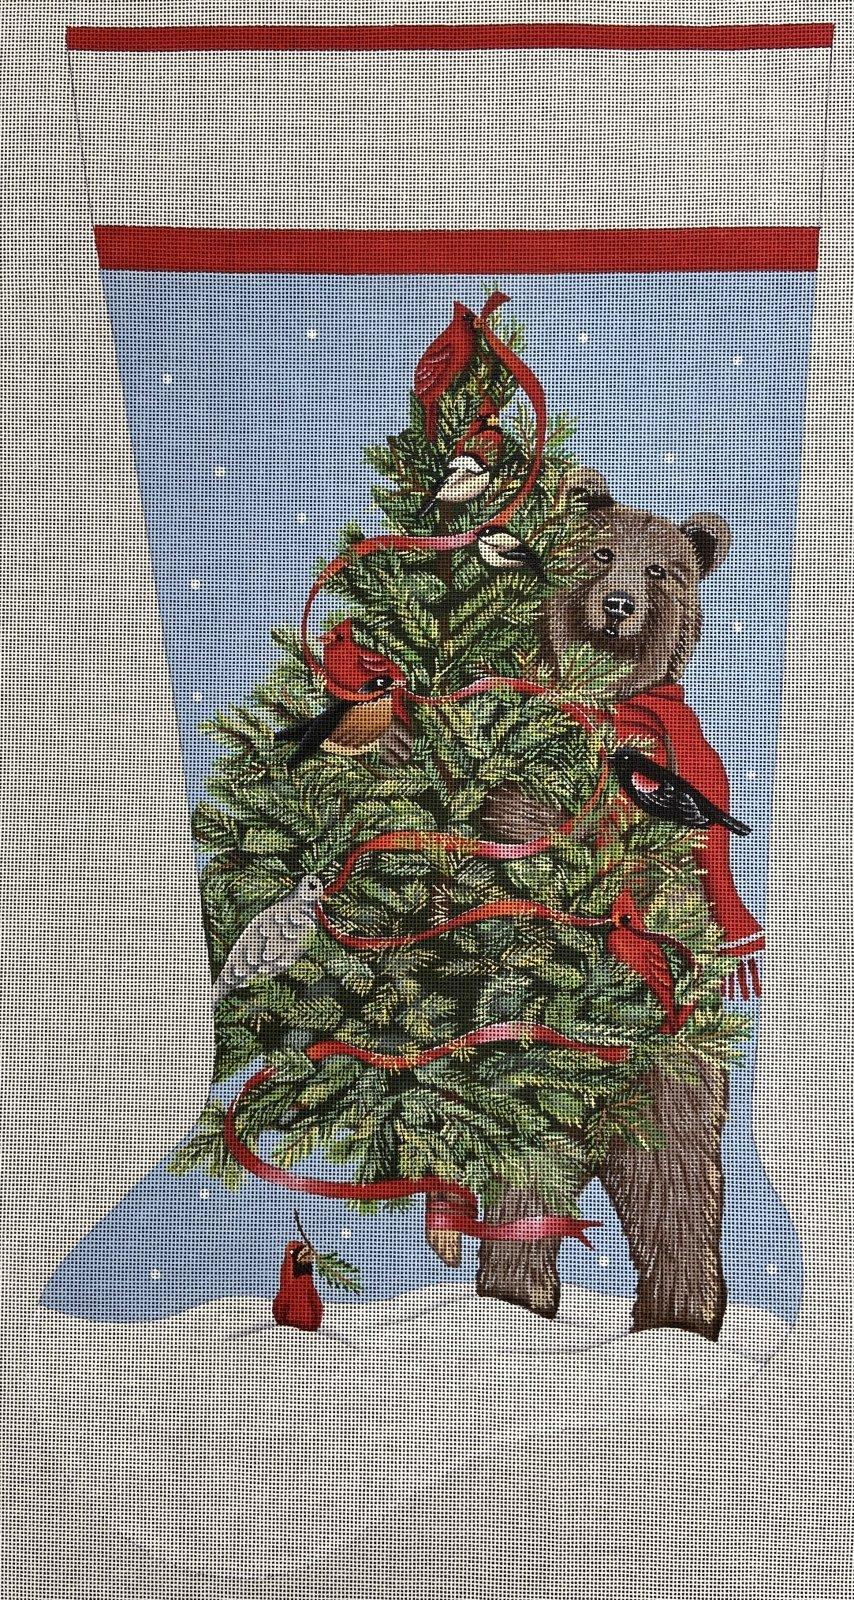 MLT421 Big Brown Bear Hold Christmas Tree Full of Cardinals Stocking  Melissa Shirley